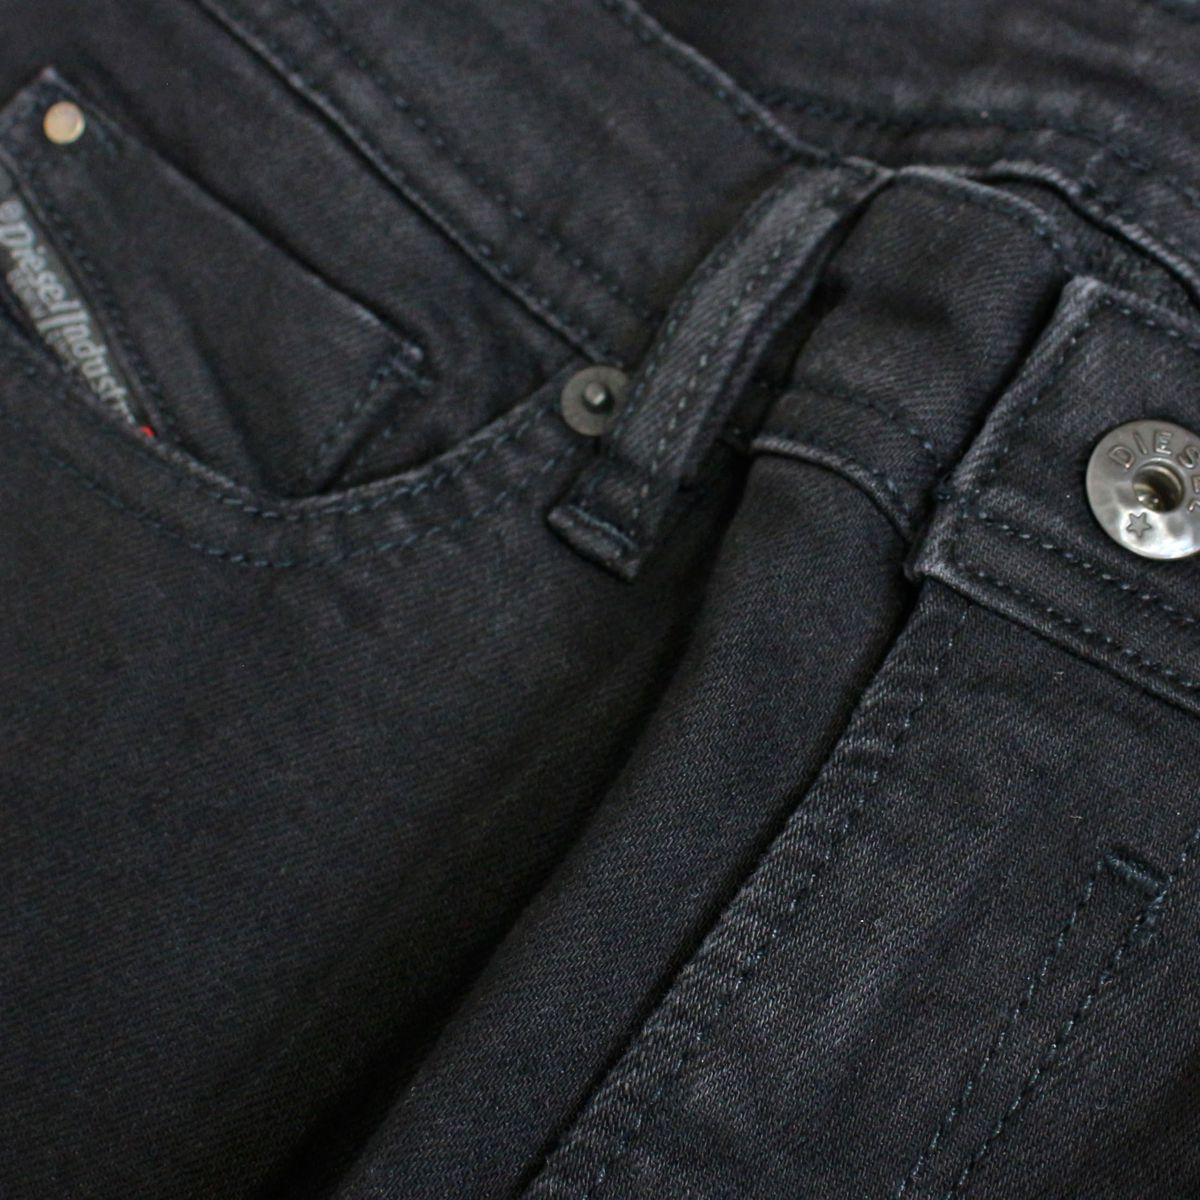 5-pocket stretch denim jeans Black denim Diesel